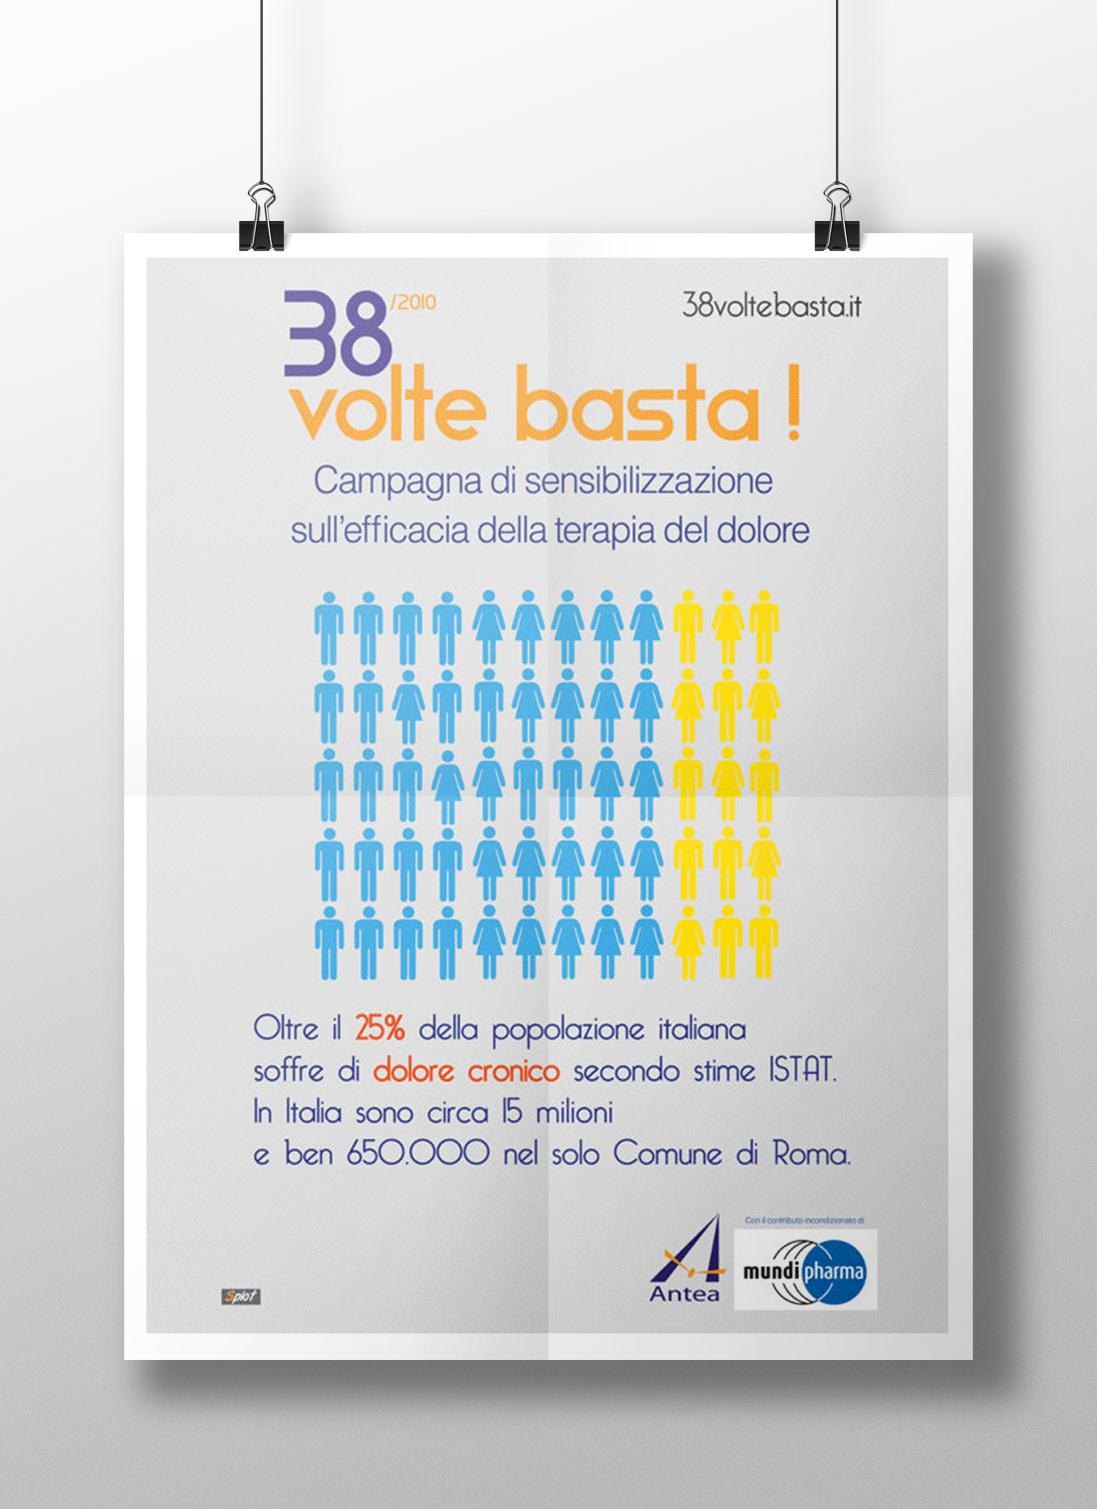 https://www.elisadellachiesa.it/wp-content/uploads/2020/01/38-volte-basta-poster-mockup.jpg